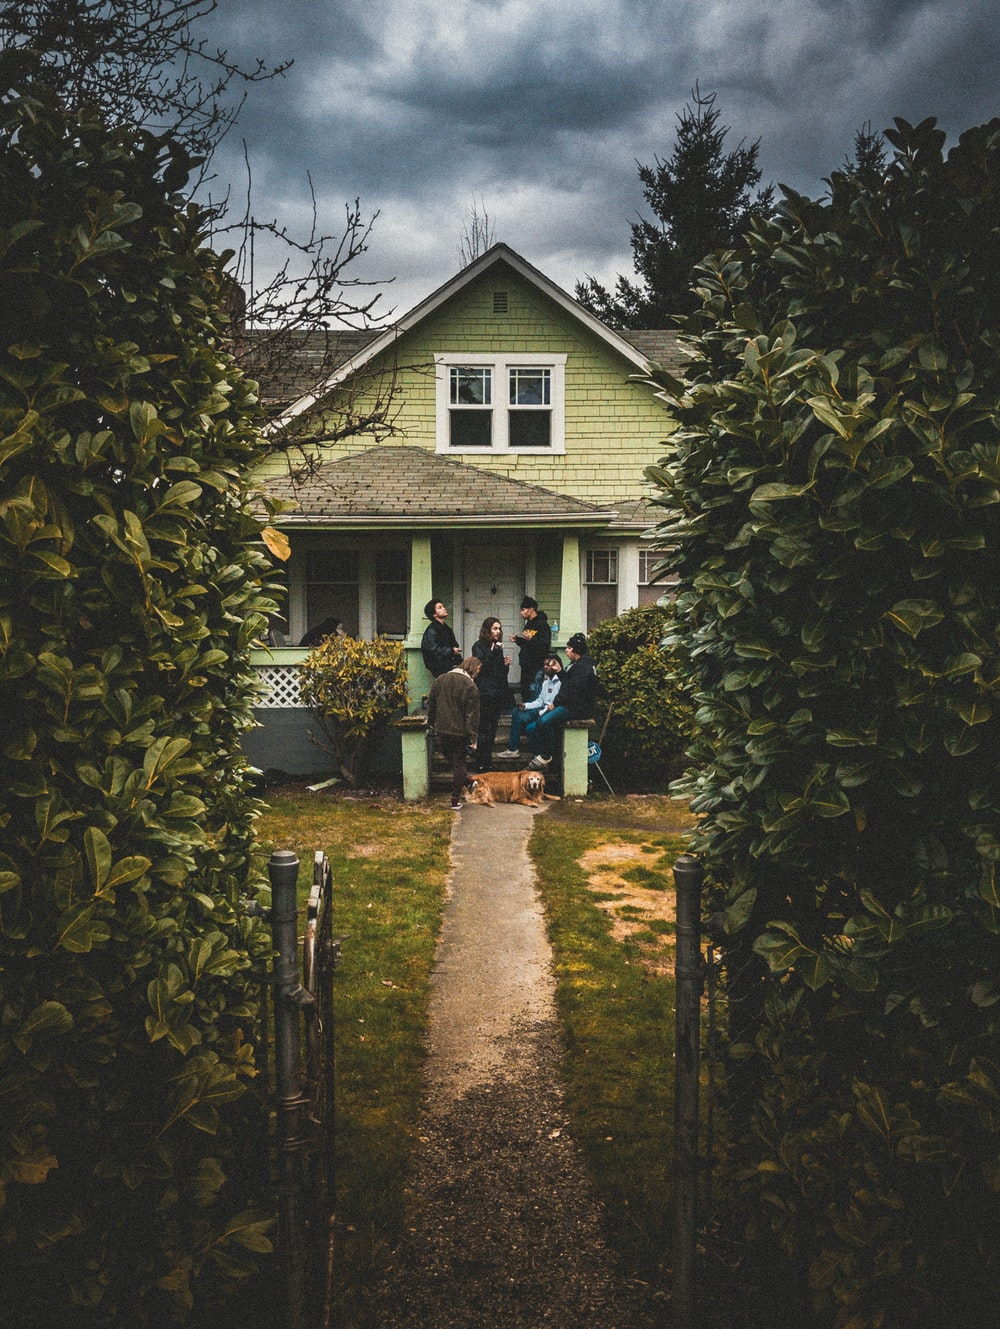 people standing near closed door house